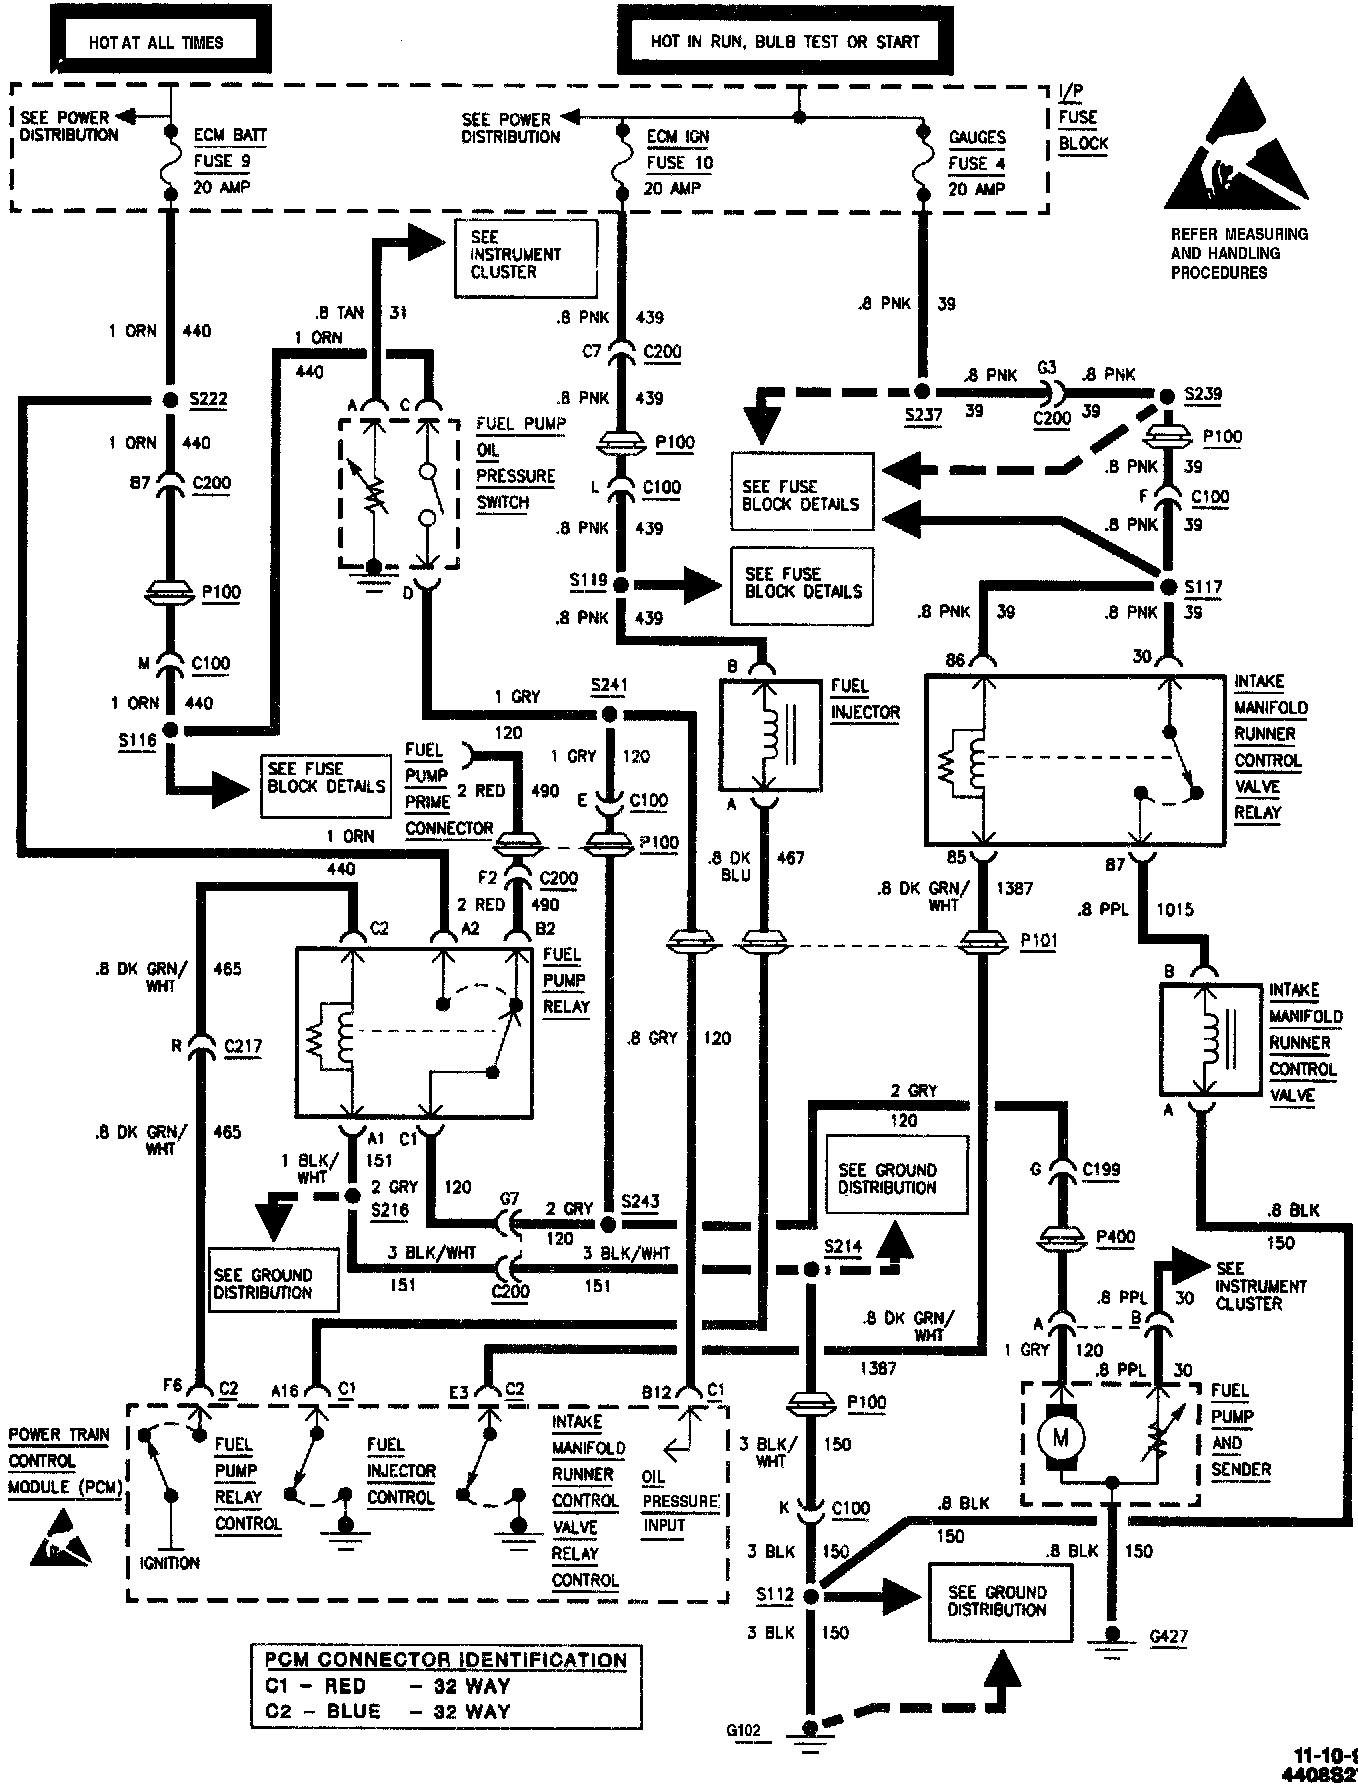 ac motor diagram pdf auto electrical wiring diagram2001 s10 tail light wiring diagram